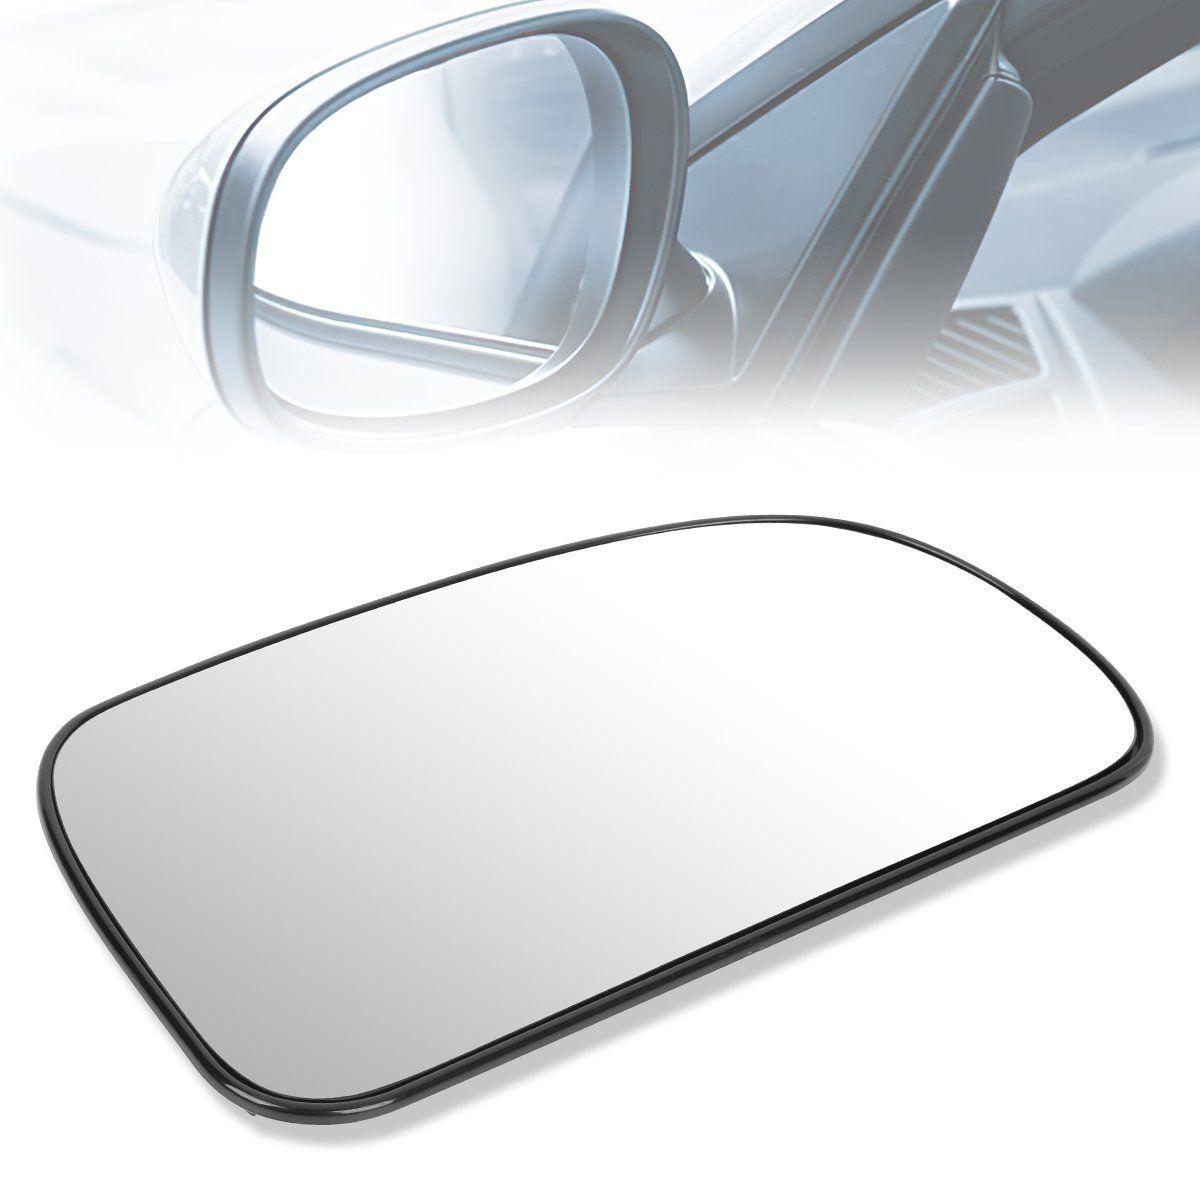 02 08 Chevy Trailblazer Buick Rainer Gmc Envoy Right Passenger Side Door Mirror Glass 19120843 In 2020 Chevy Trailblazer Gmc Envoy Mirror Door